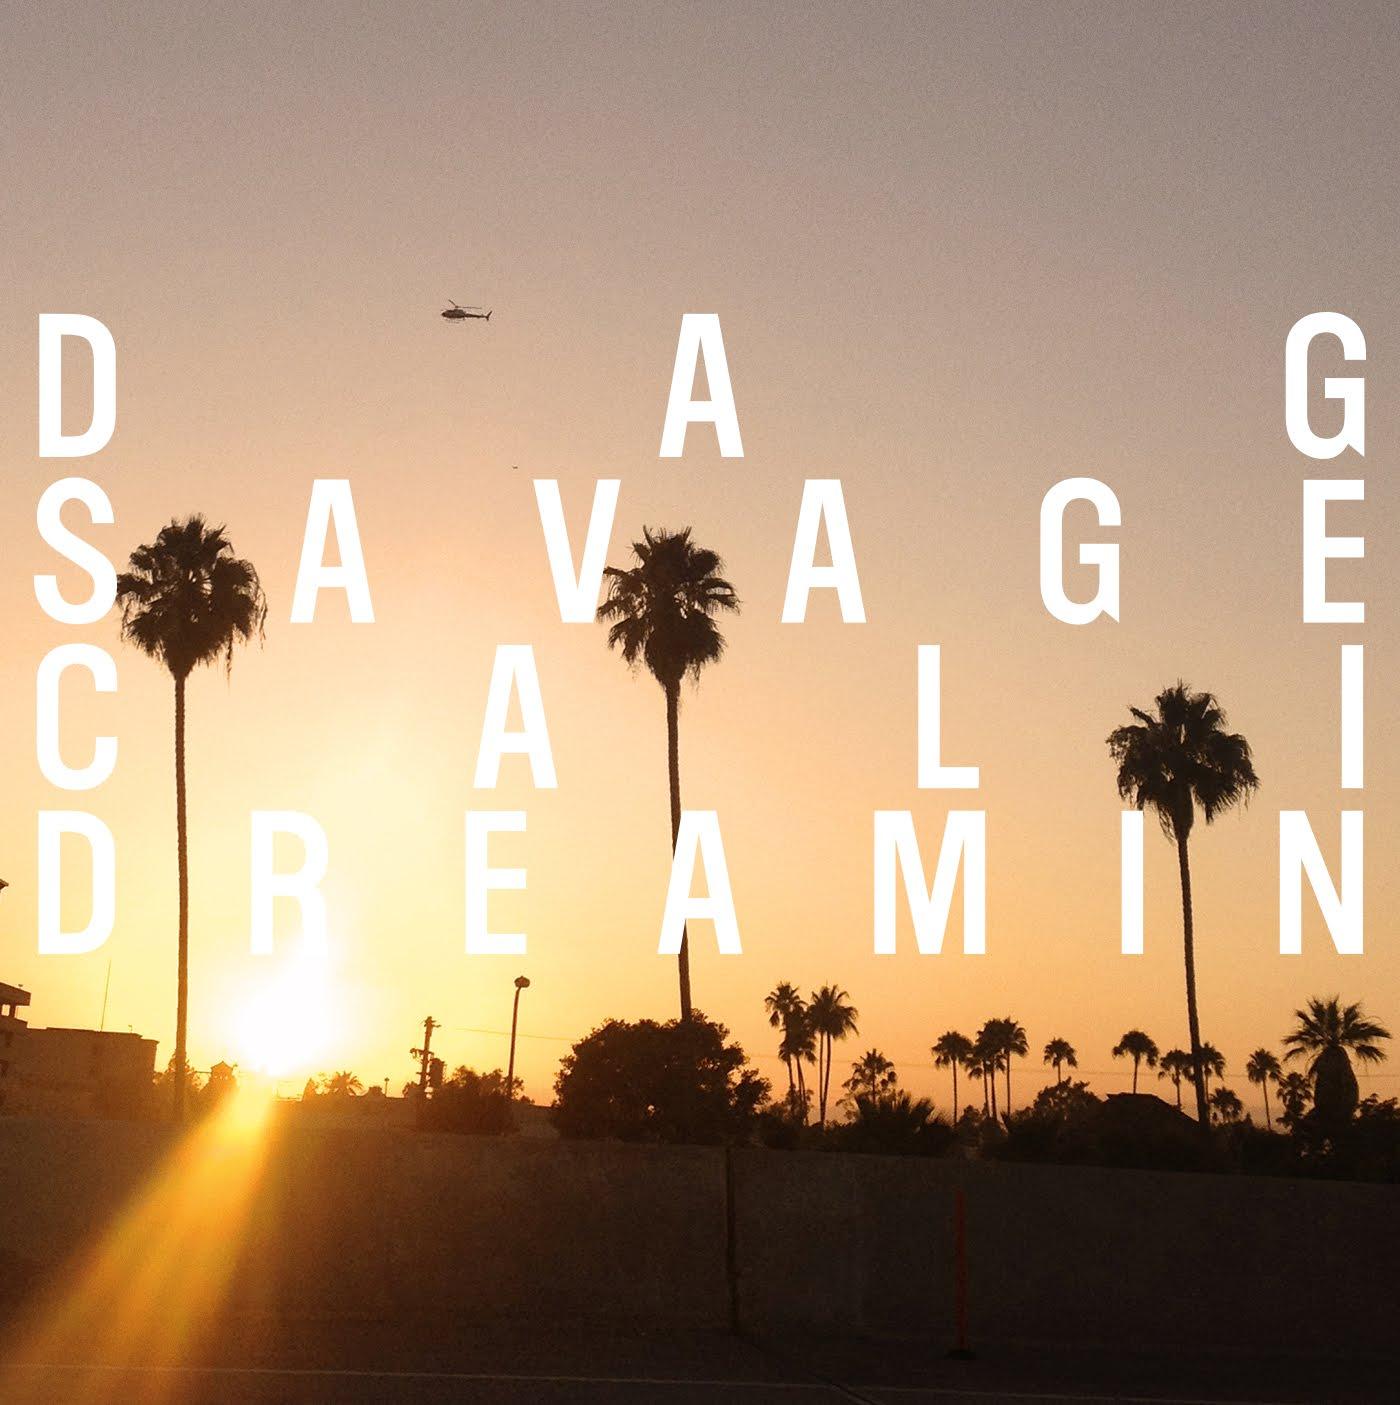 http://1.bp.blogspot.com/-USSbSkoptXs/UGAwre9JYtI/AAAAAAAAB60/gRrdB-mCZ0M/s1600/Dag-Savage-Cali-Dreamin-Exile.jpg